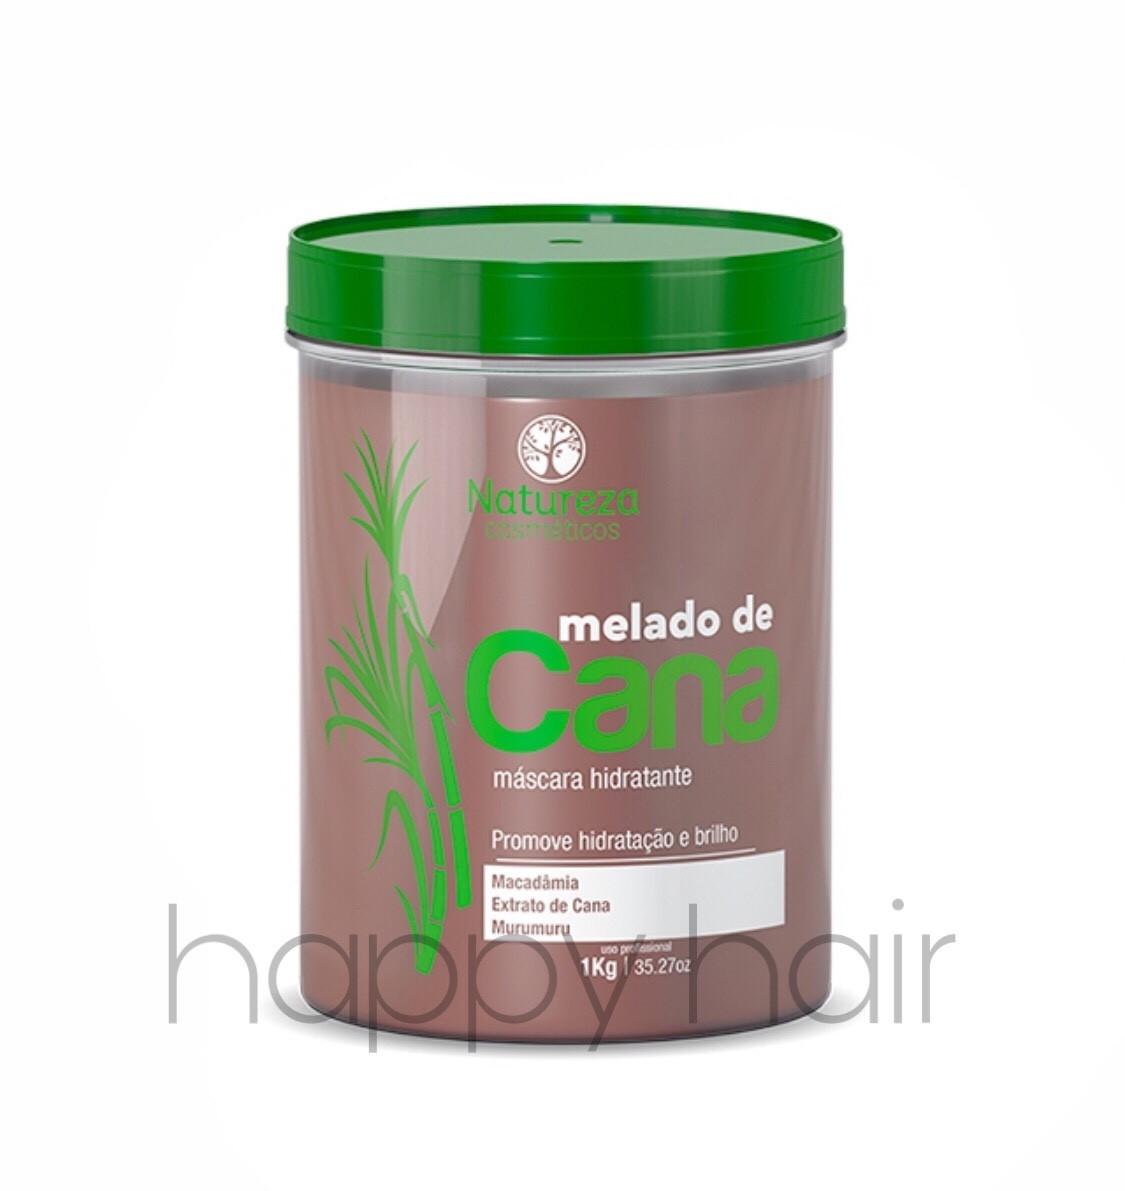 NATUREZA Melado de Cana Máscara Hidratante ботекс-гиперувлажнение для волос 1000 г